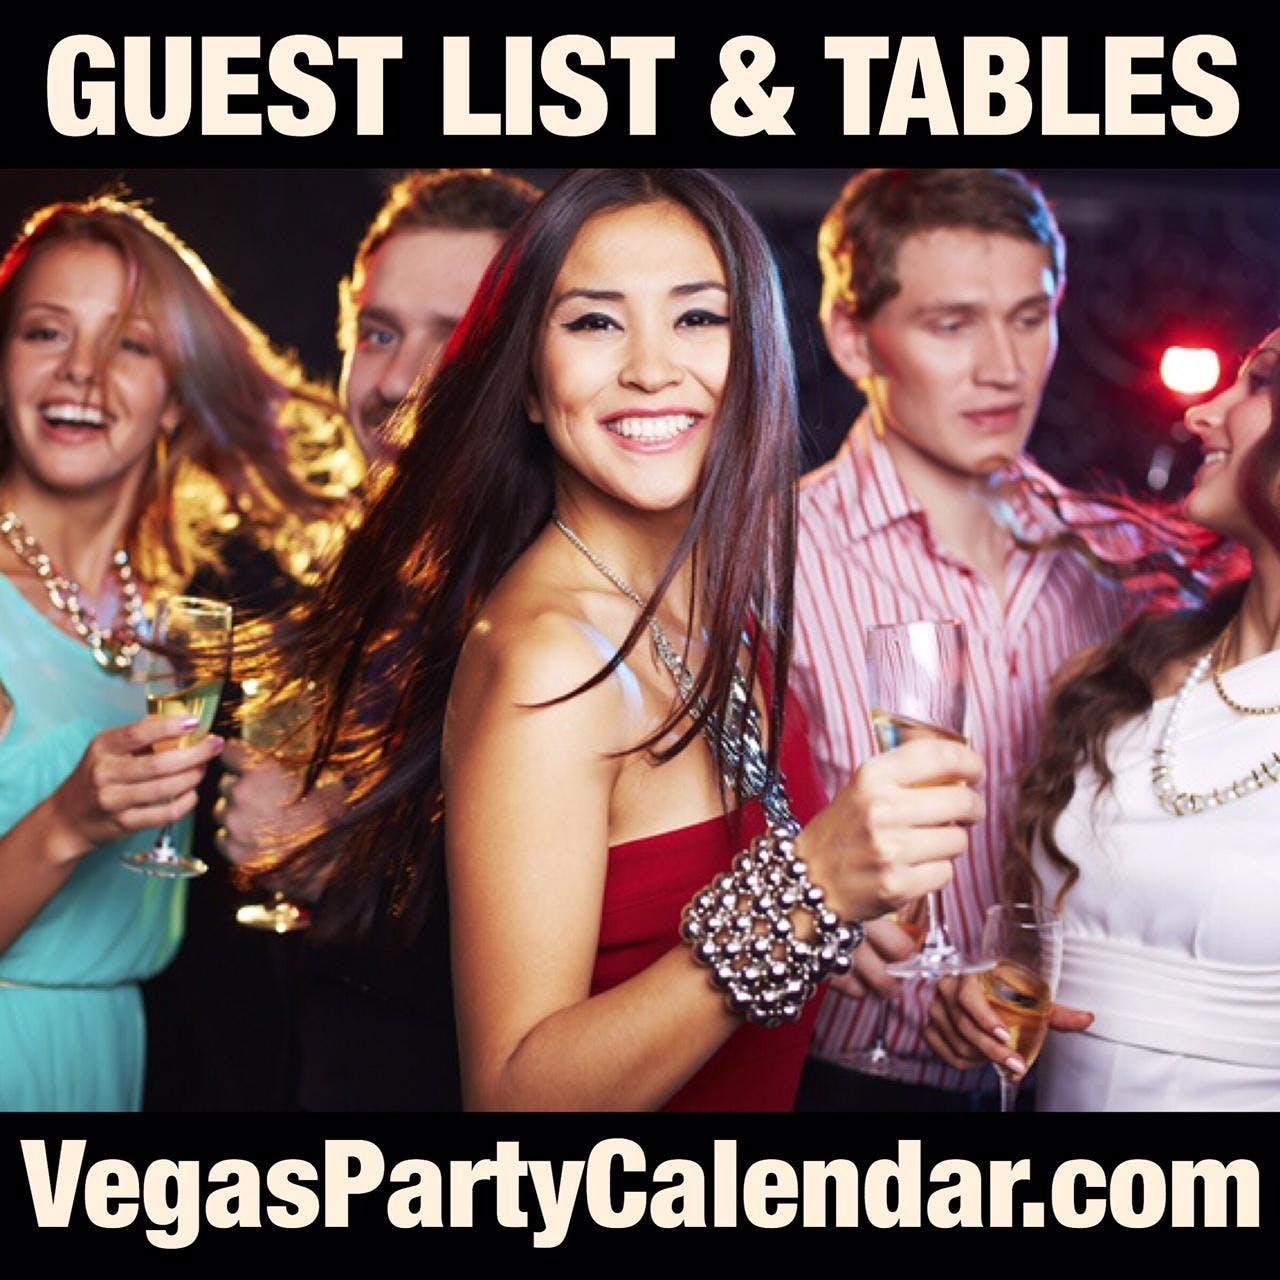 KAOS Vegas Nightclub @ Palms - Guest List & B